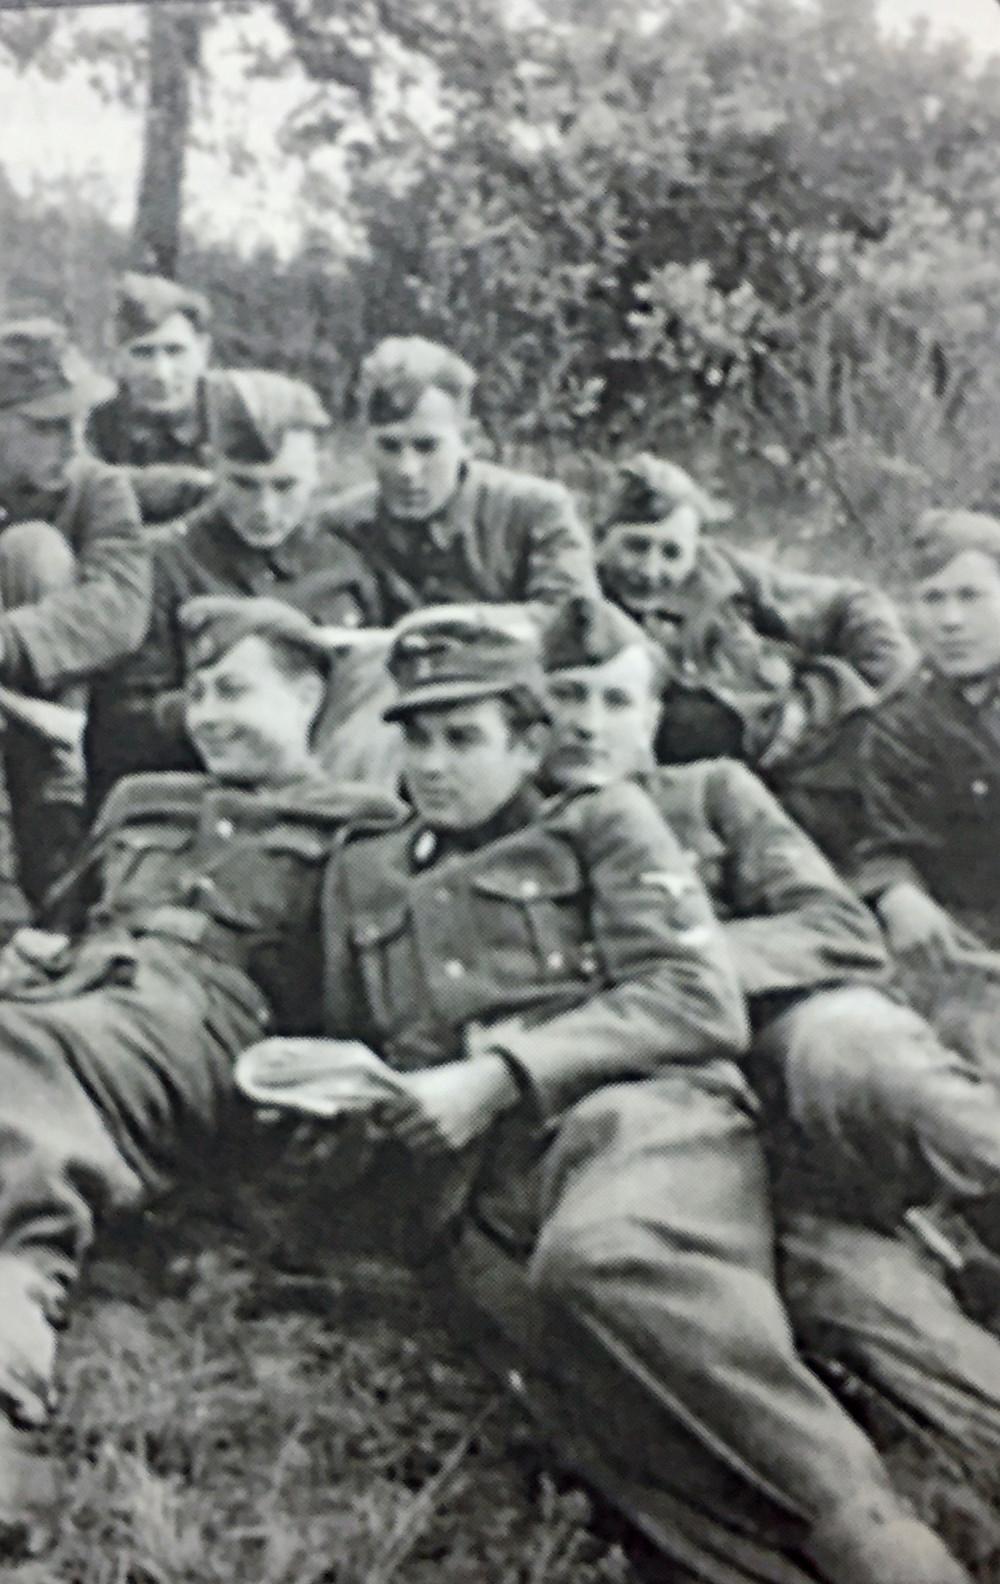 Bankovičs retells his duty in the Latvian Legion.